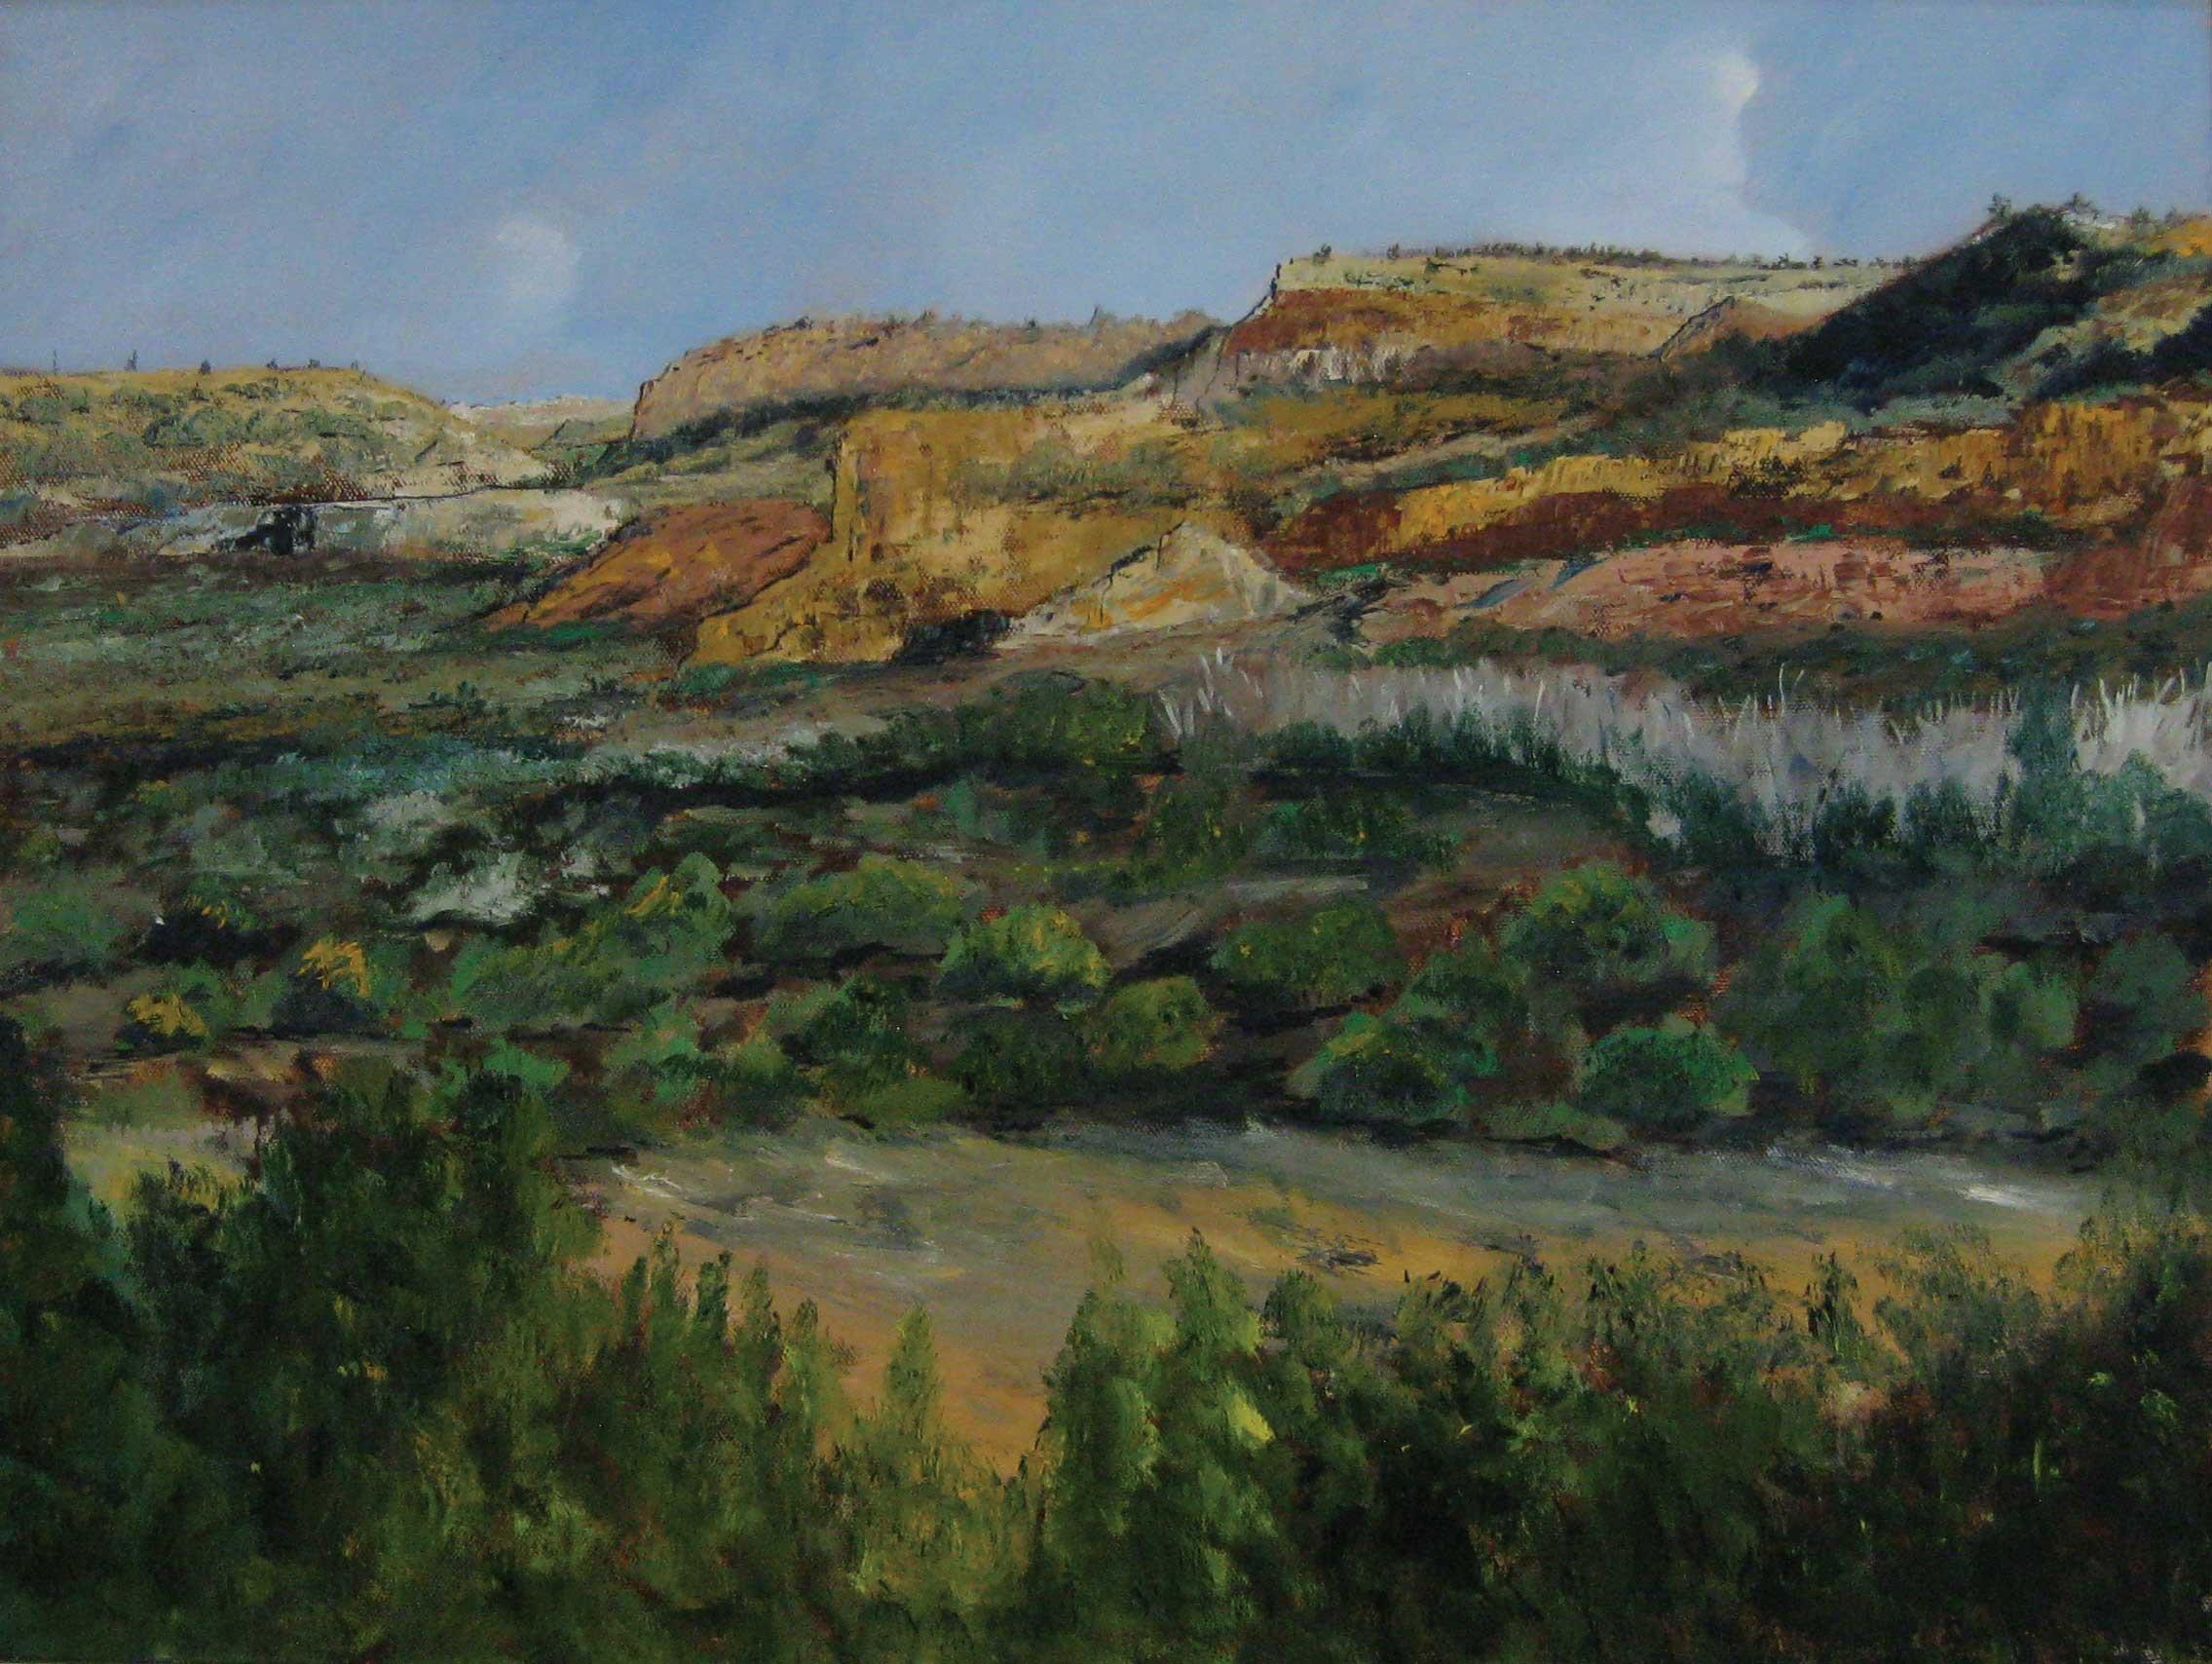 Texas Textures, 18 x 24 Oil